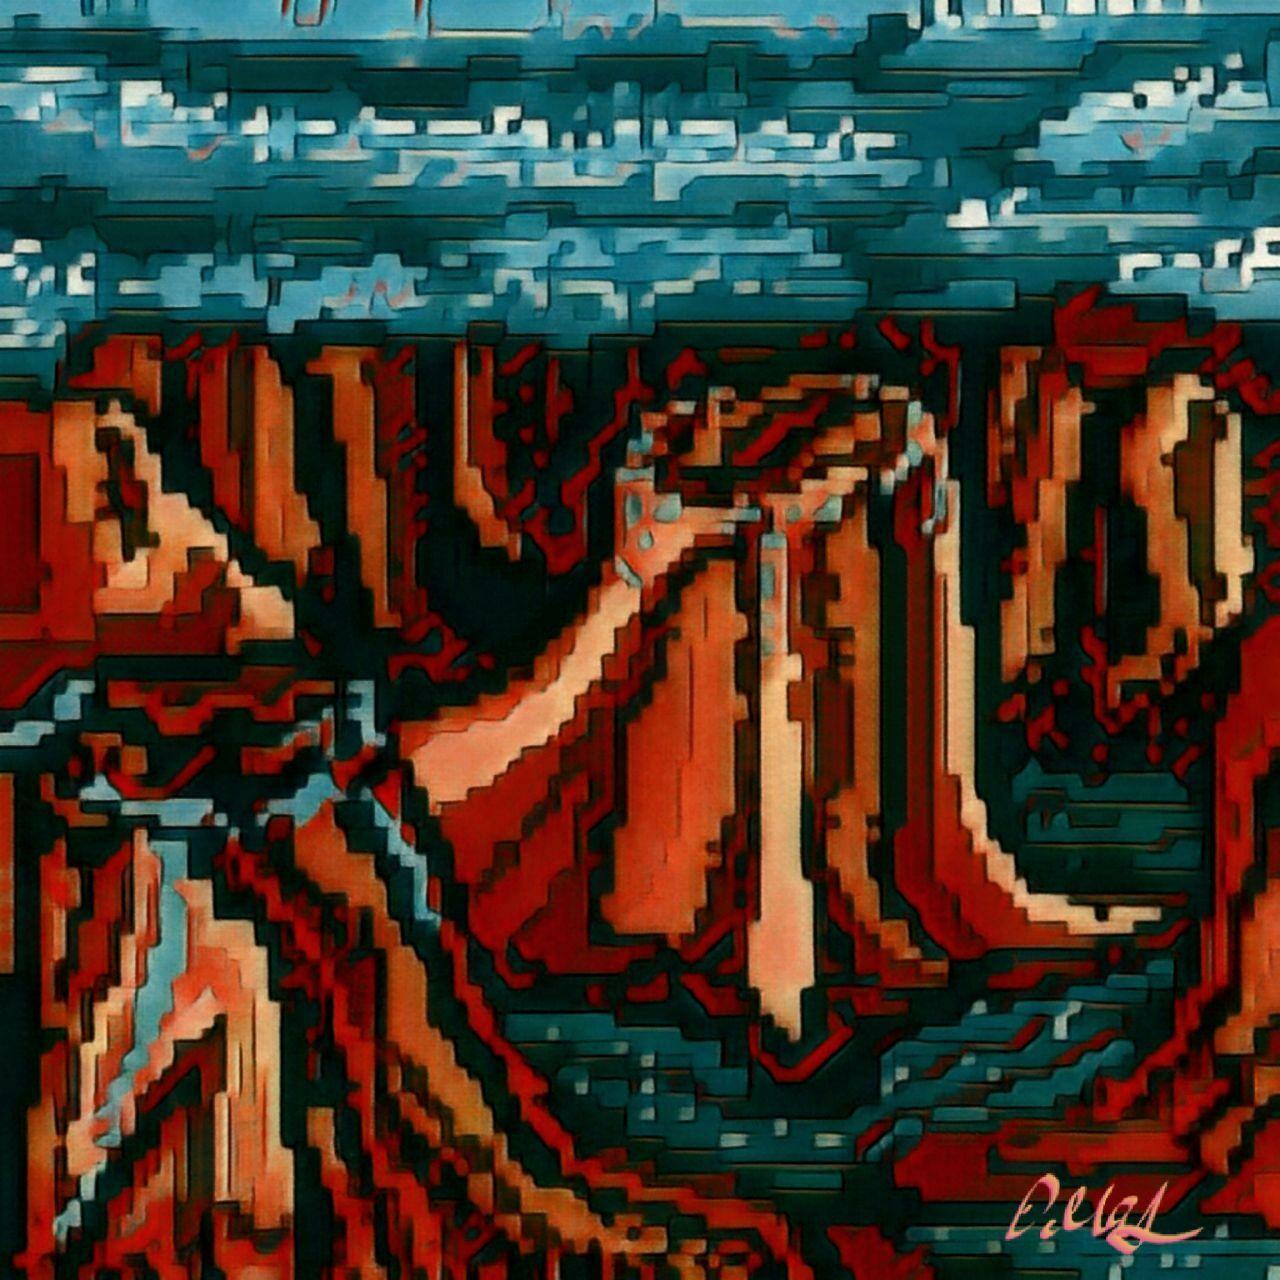 Red canyon pixel art artwork